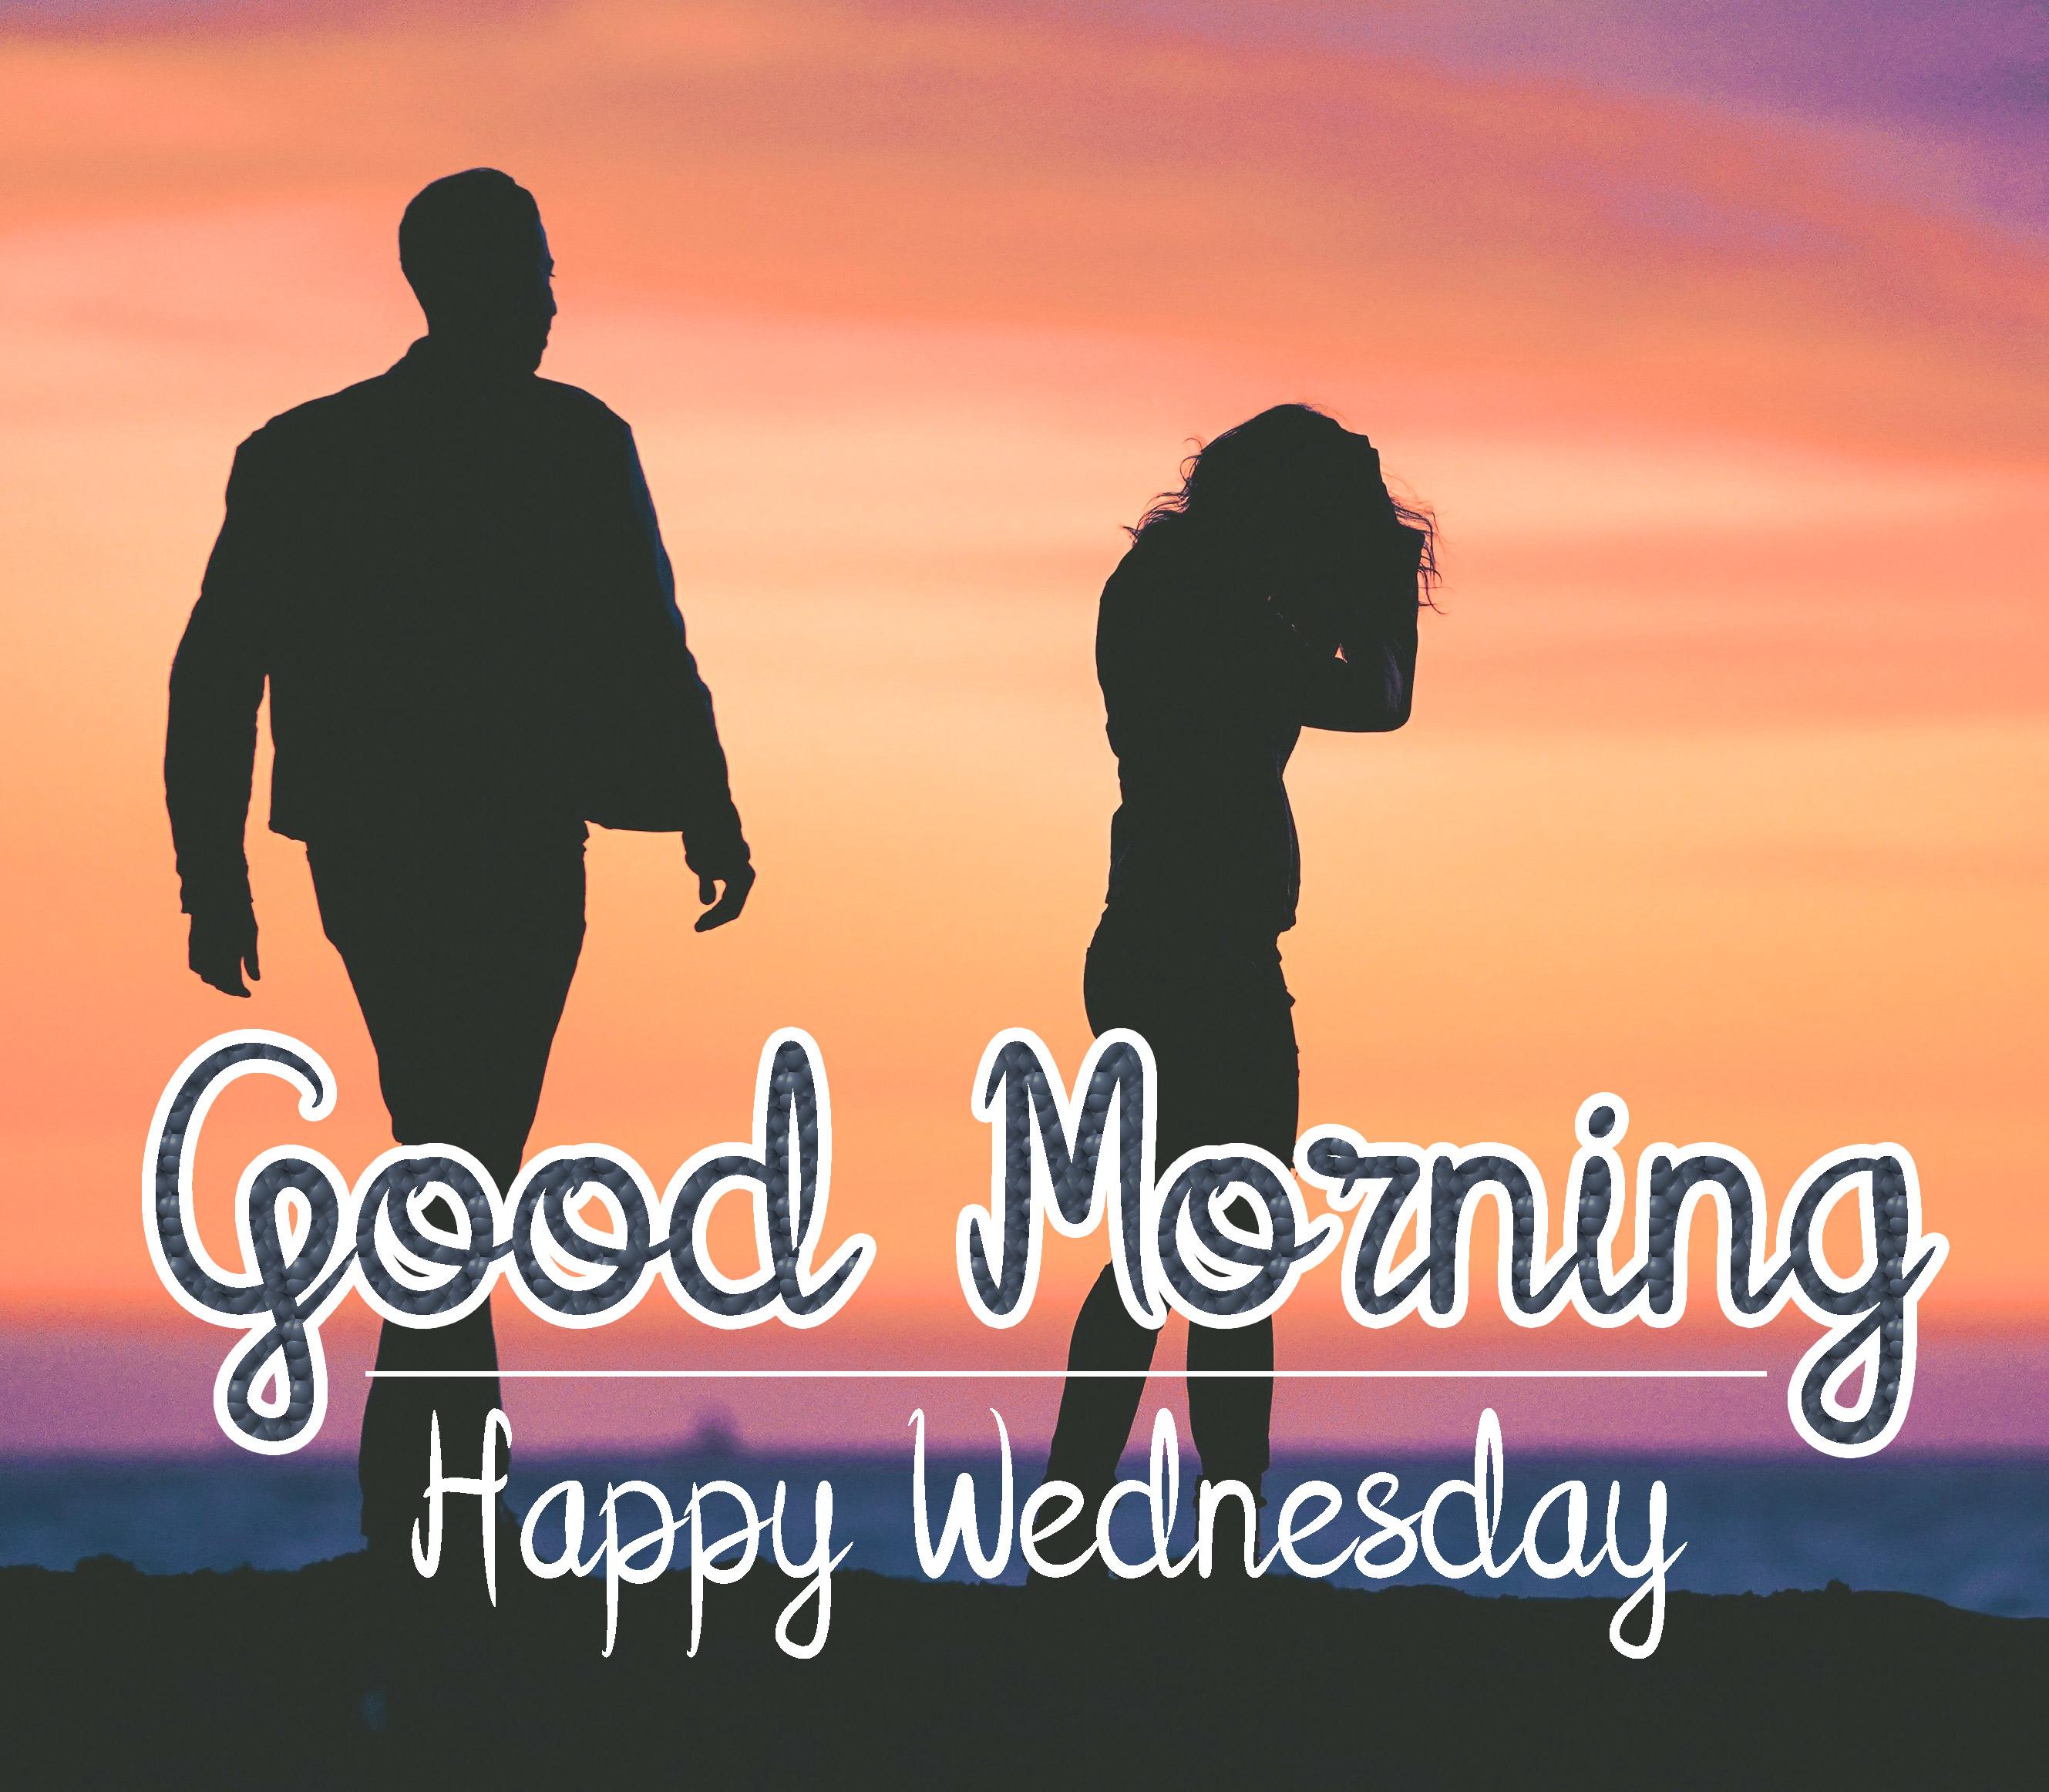 Good Morning Wednesday Pics For Lover